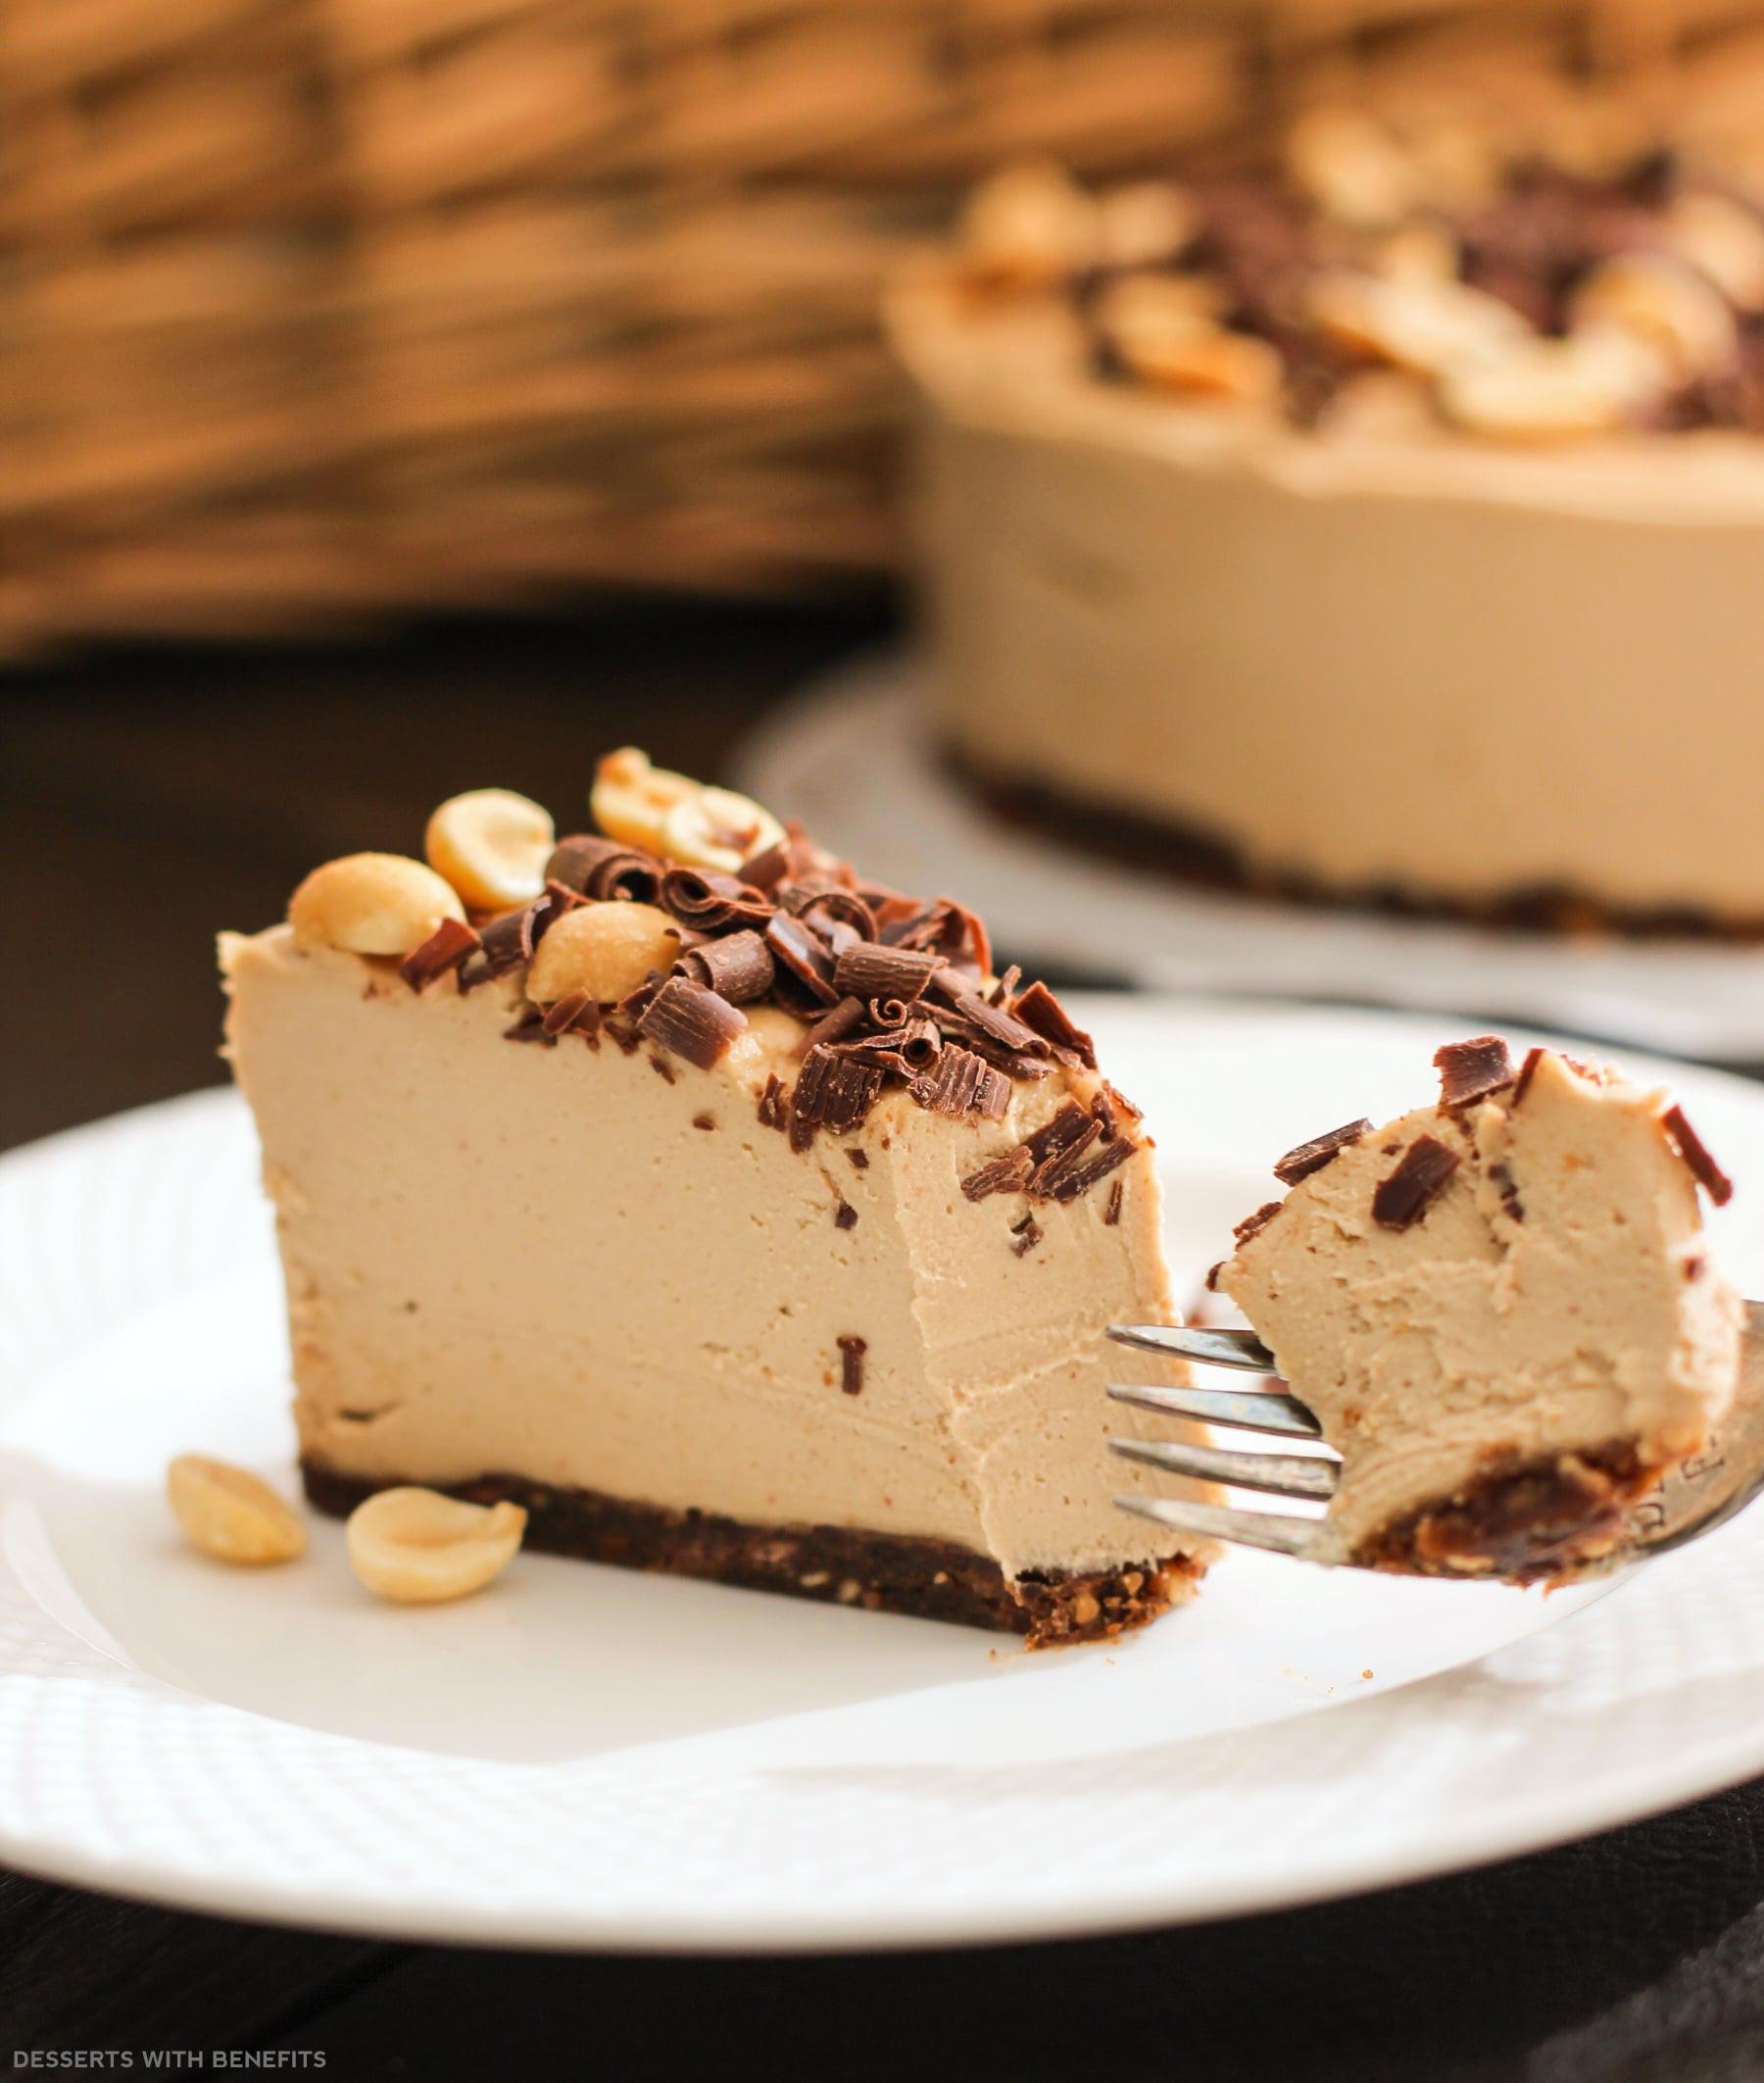 Gluten Free Recipes Dessert  Desserts With Benefits Healthy Chocolate Peanut Butter Raw